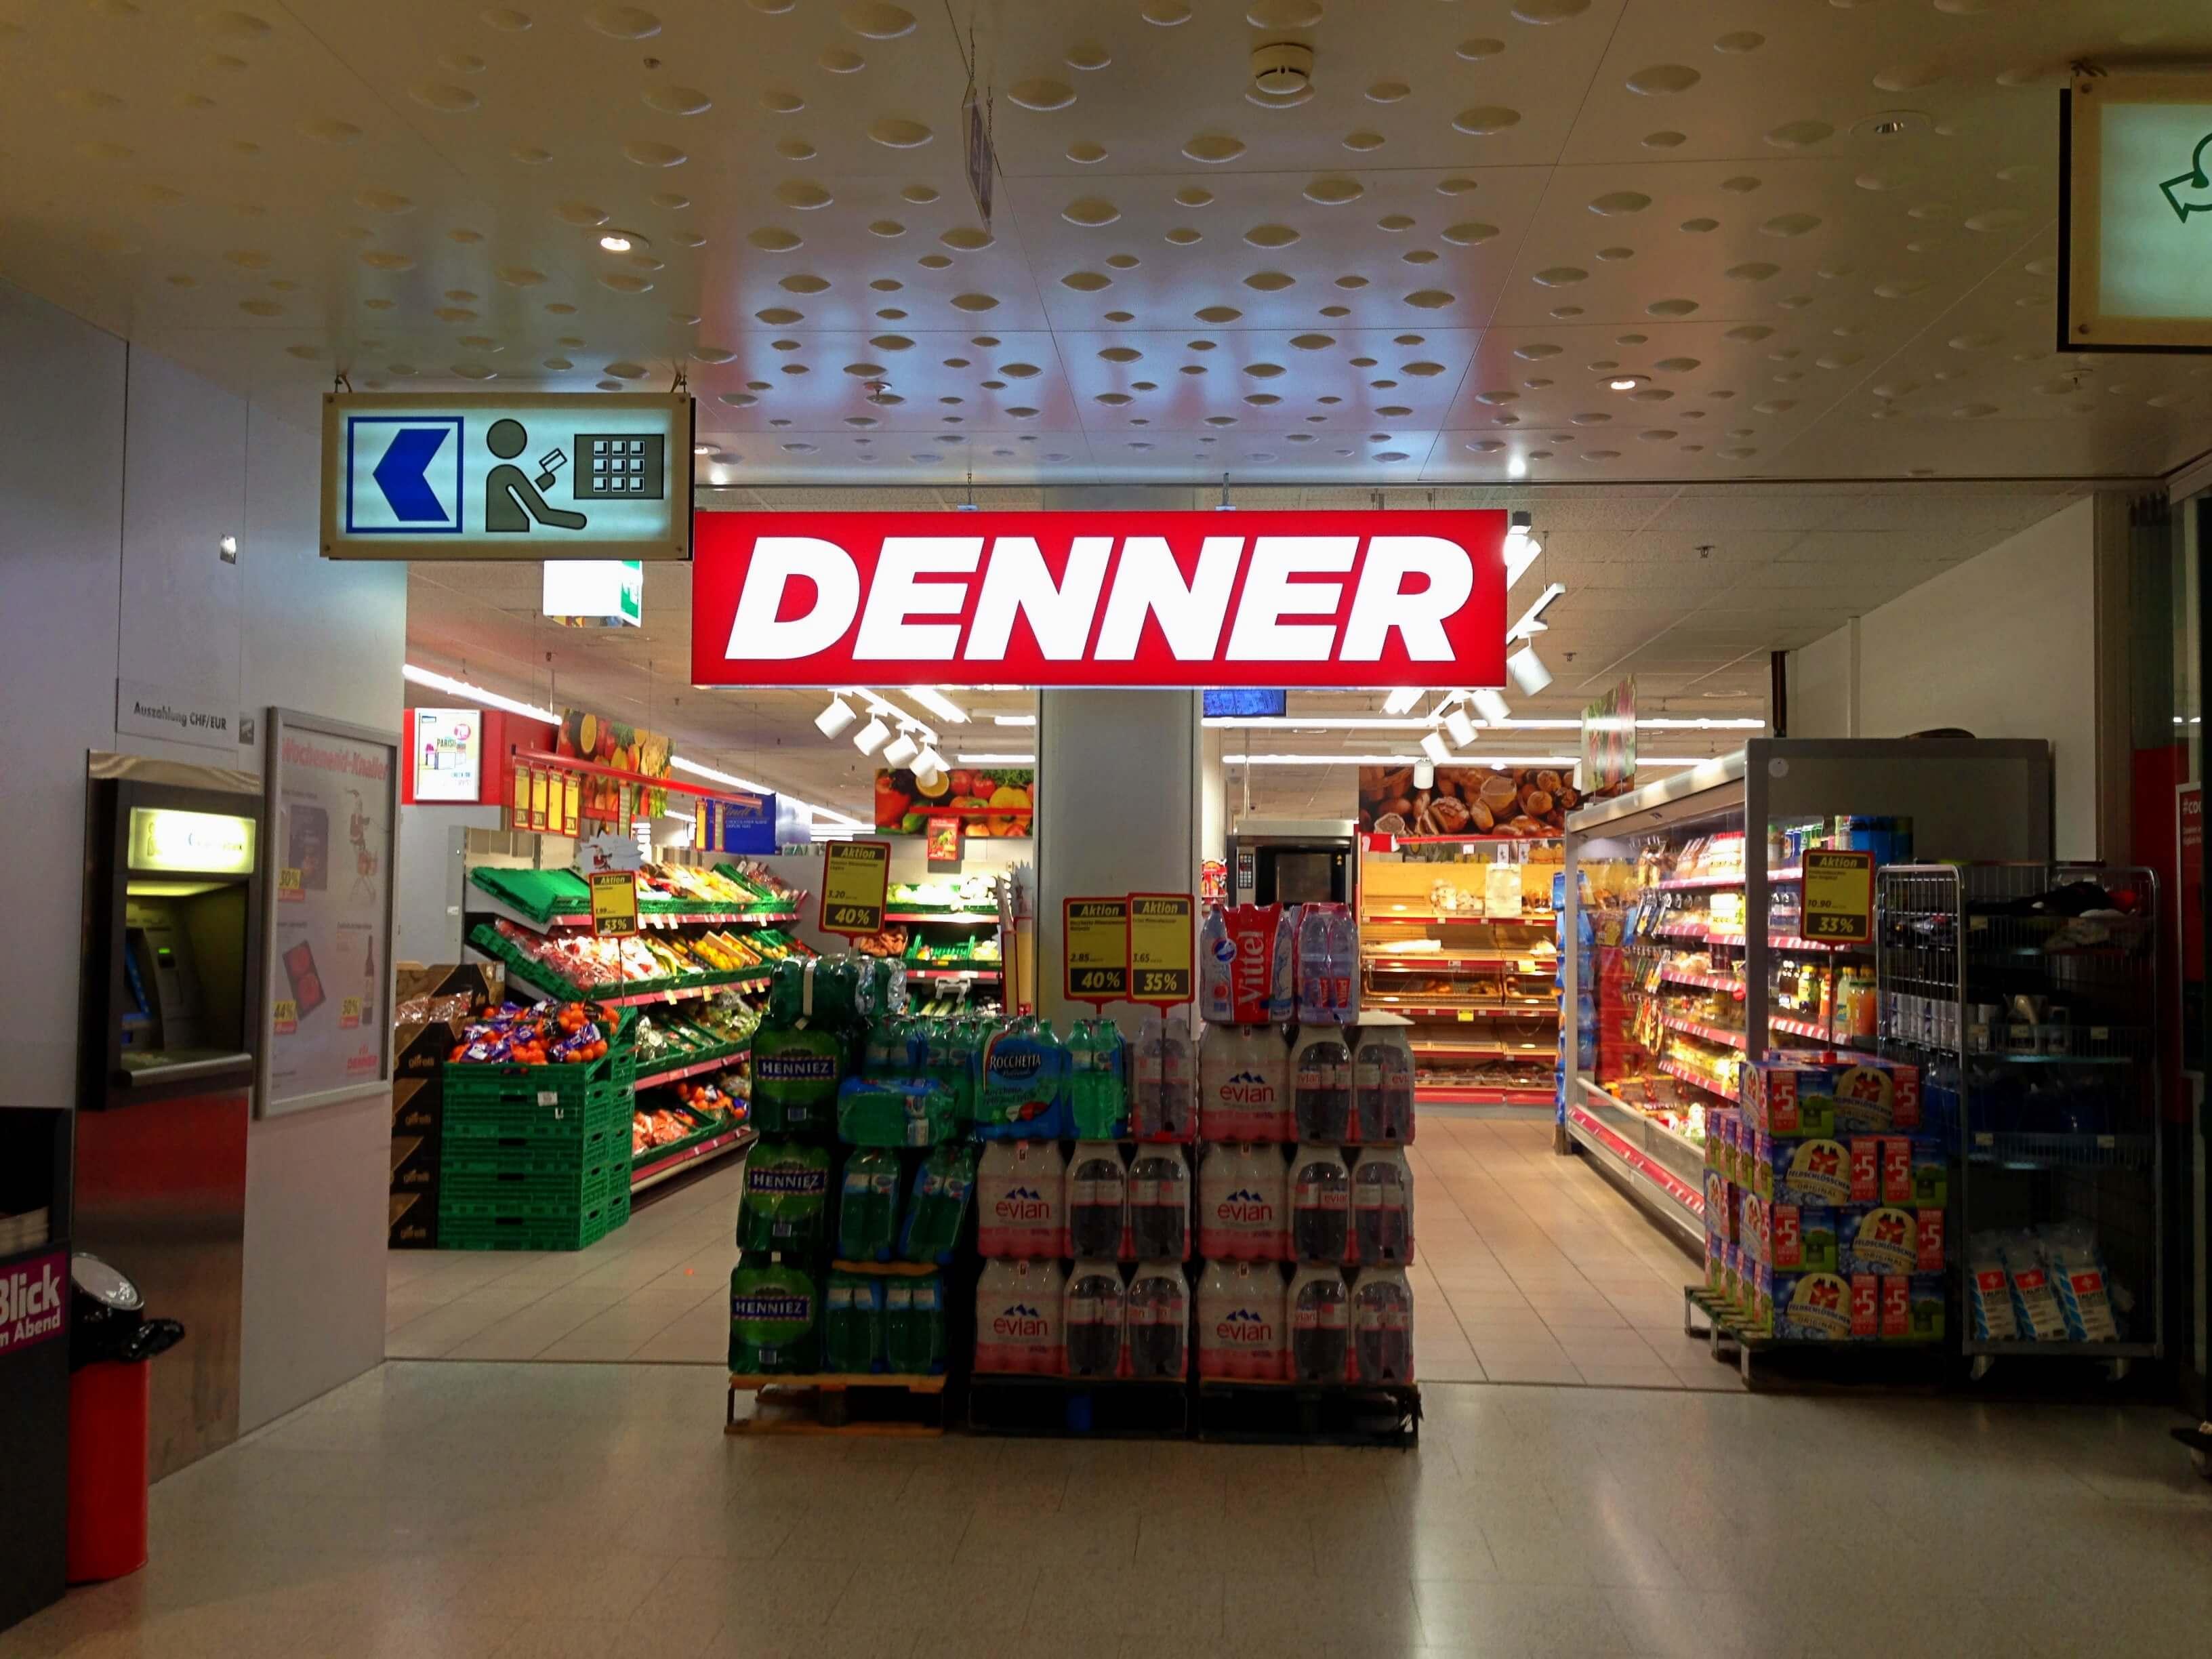 Denner discount supermarket